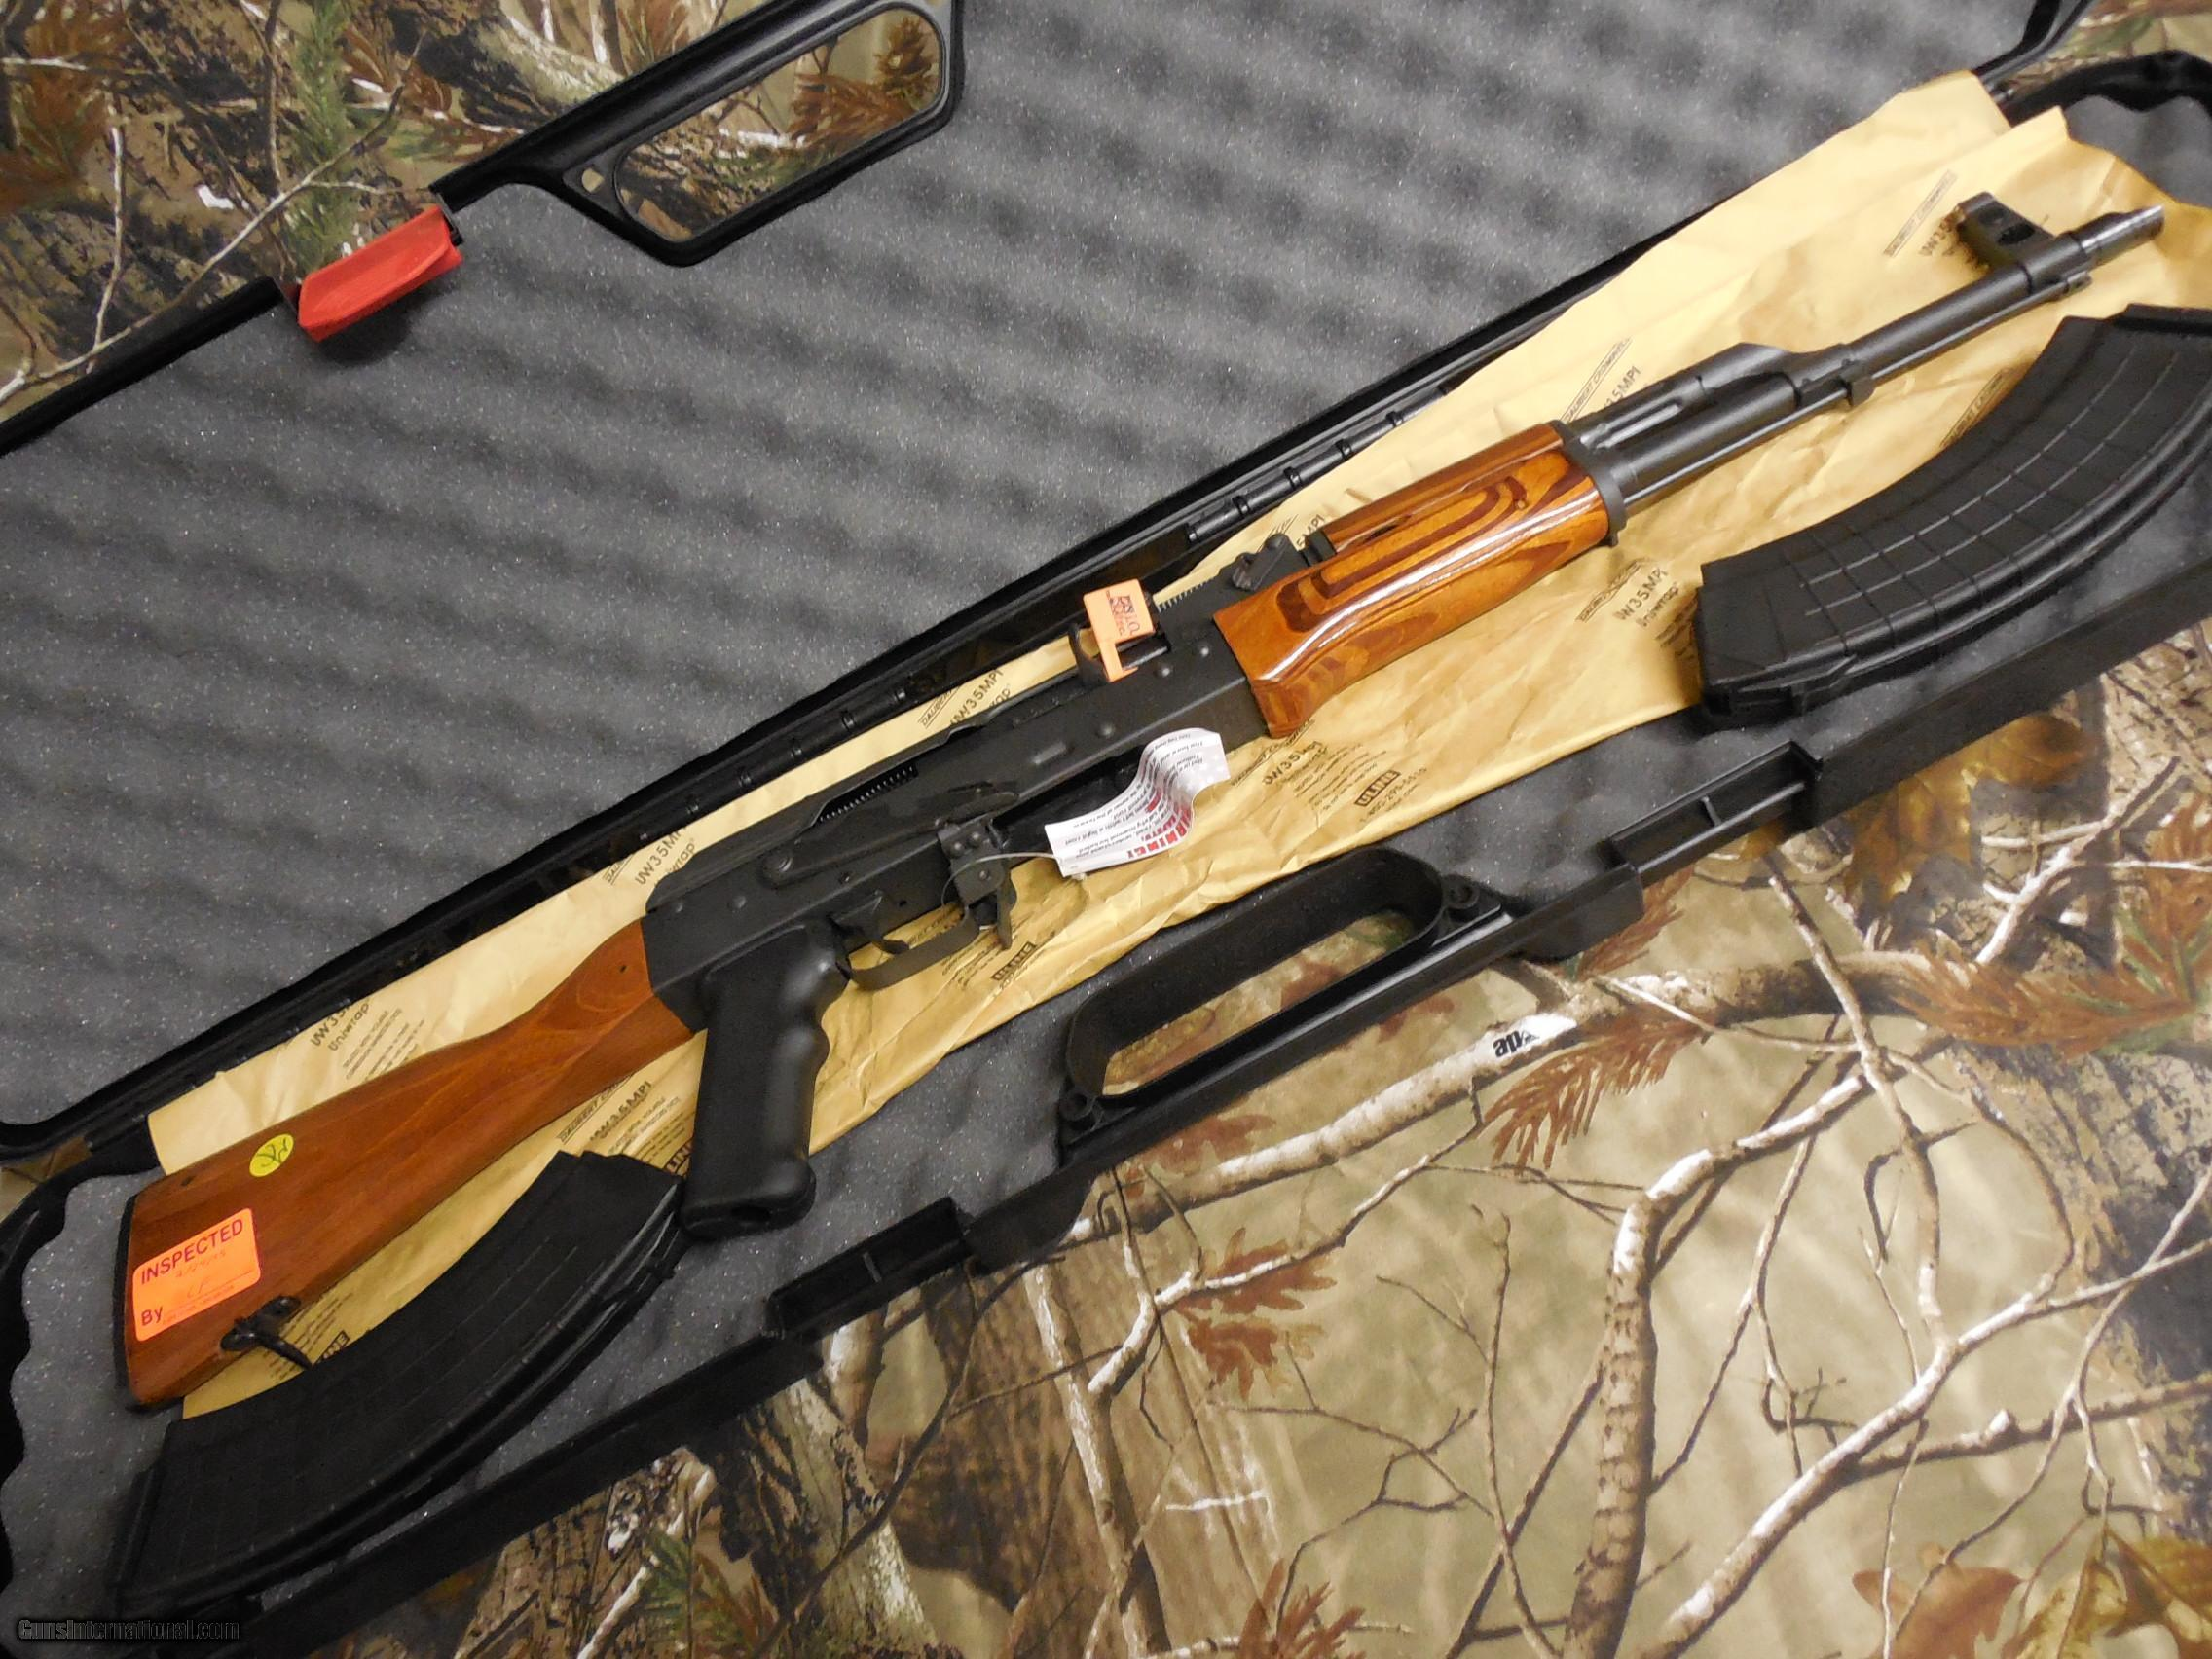 AK 47 INTER ORDNANCE 7 62 X 39 TACTICAL RIFLE WOOD STOCK